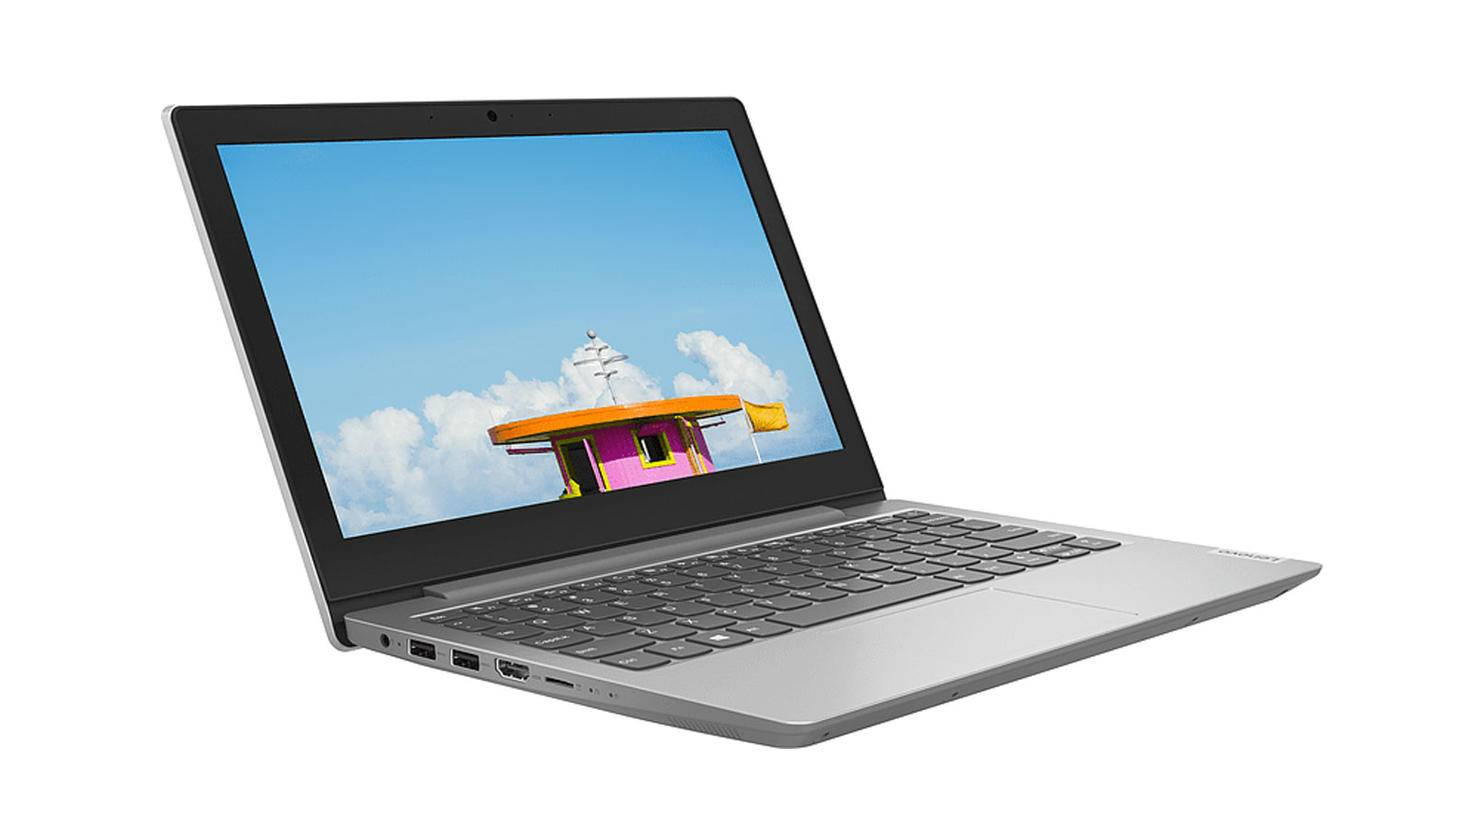 Notebook Laptop Ideapad 1